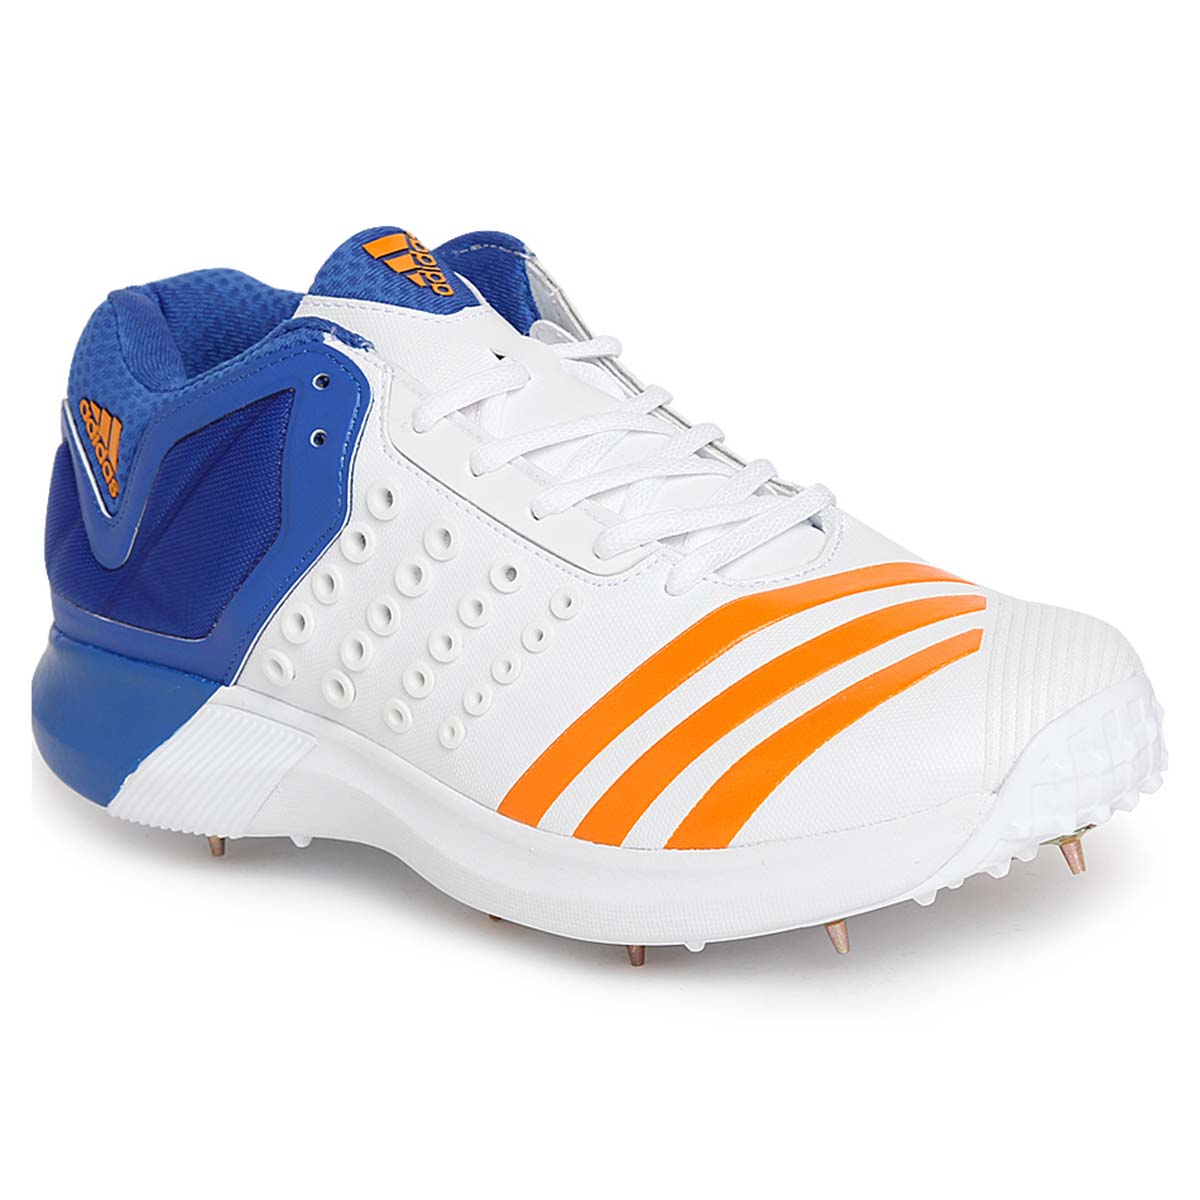 Buy Adidas AdiPower Vector Mid Cricket